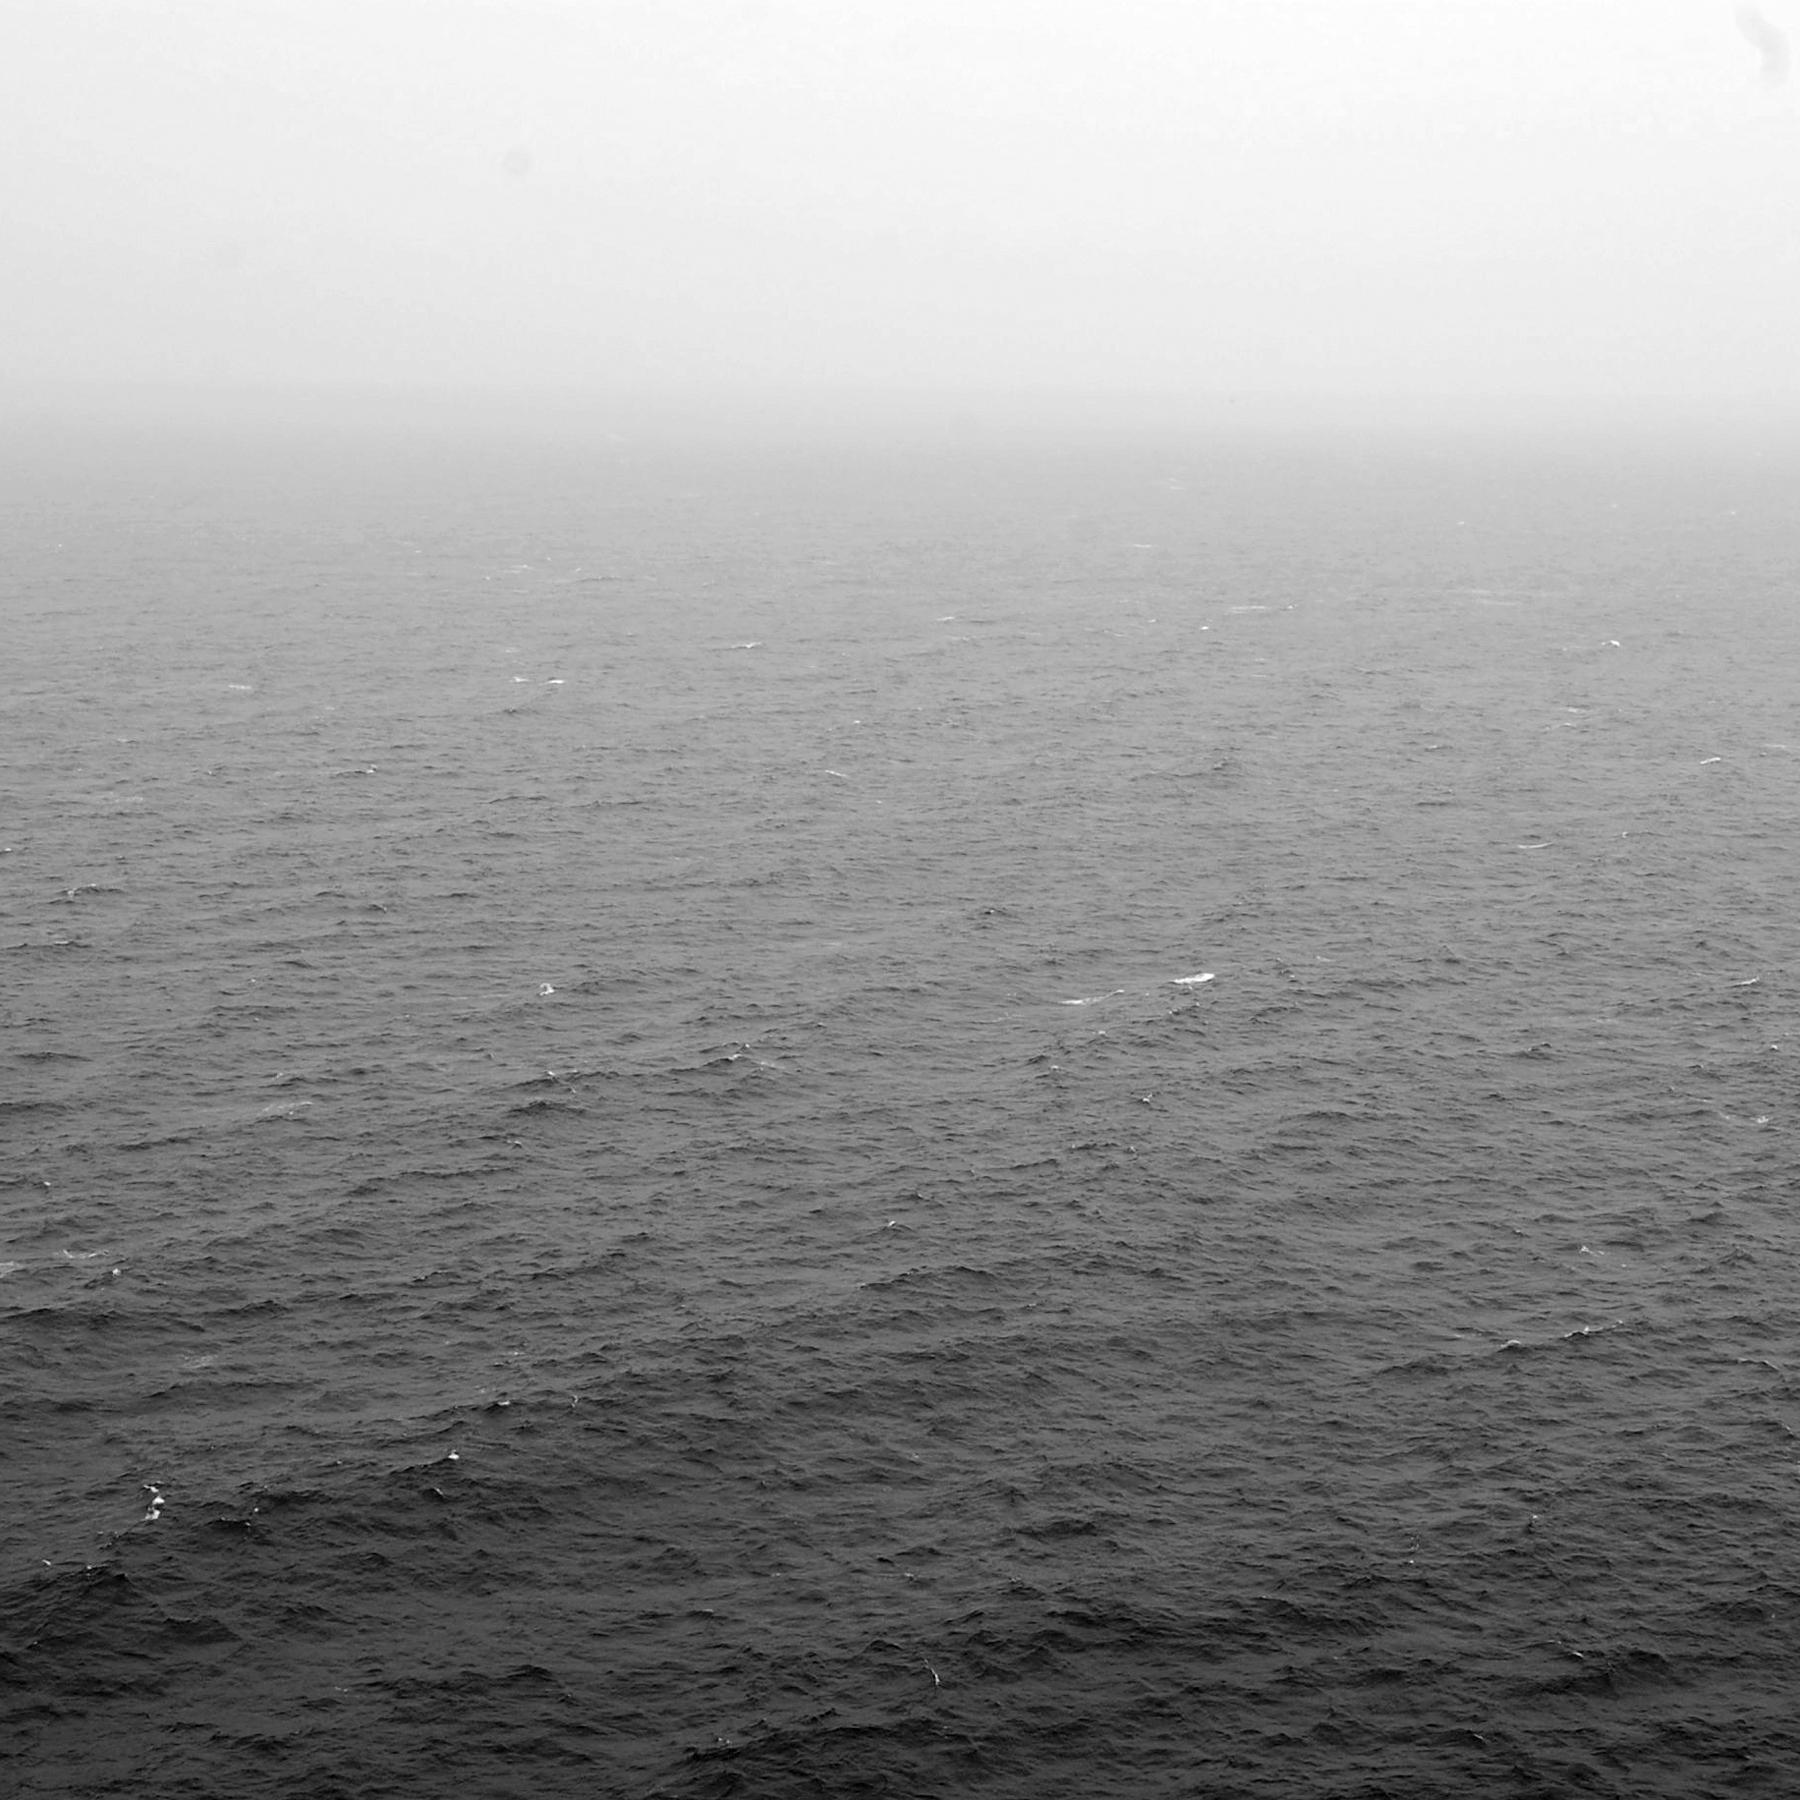 The sea on a foggy day.